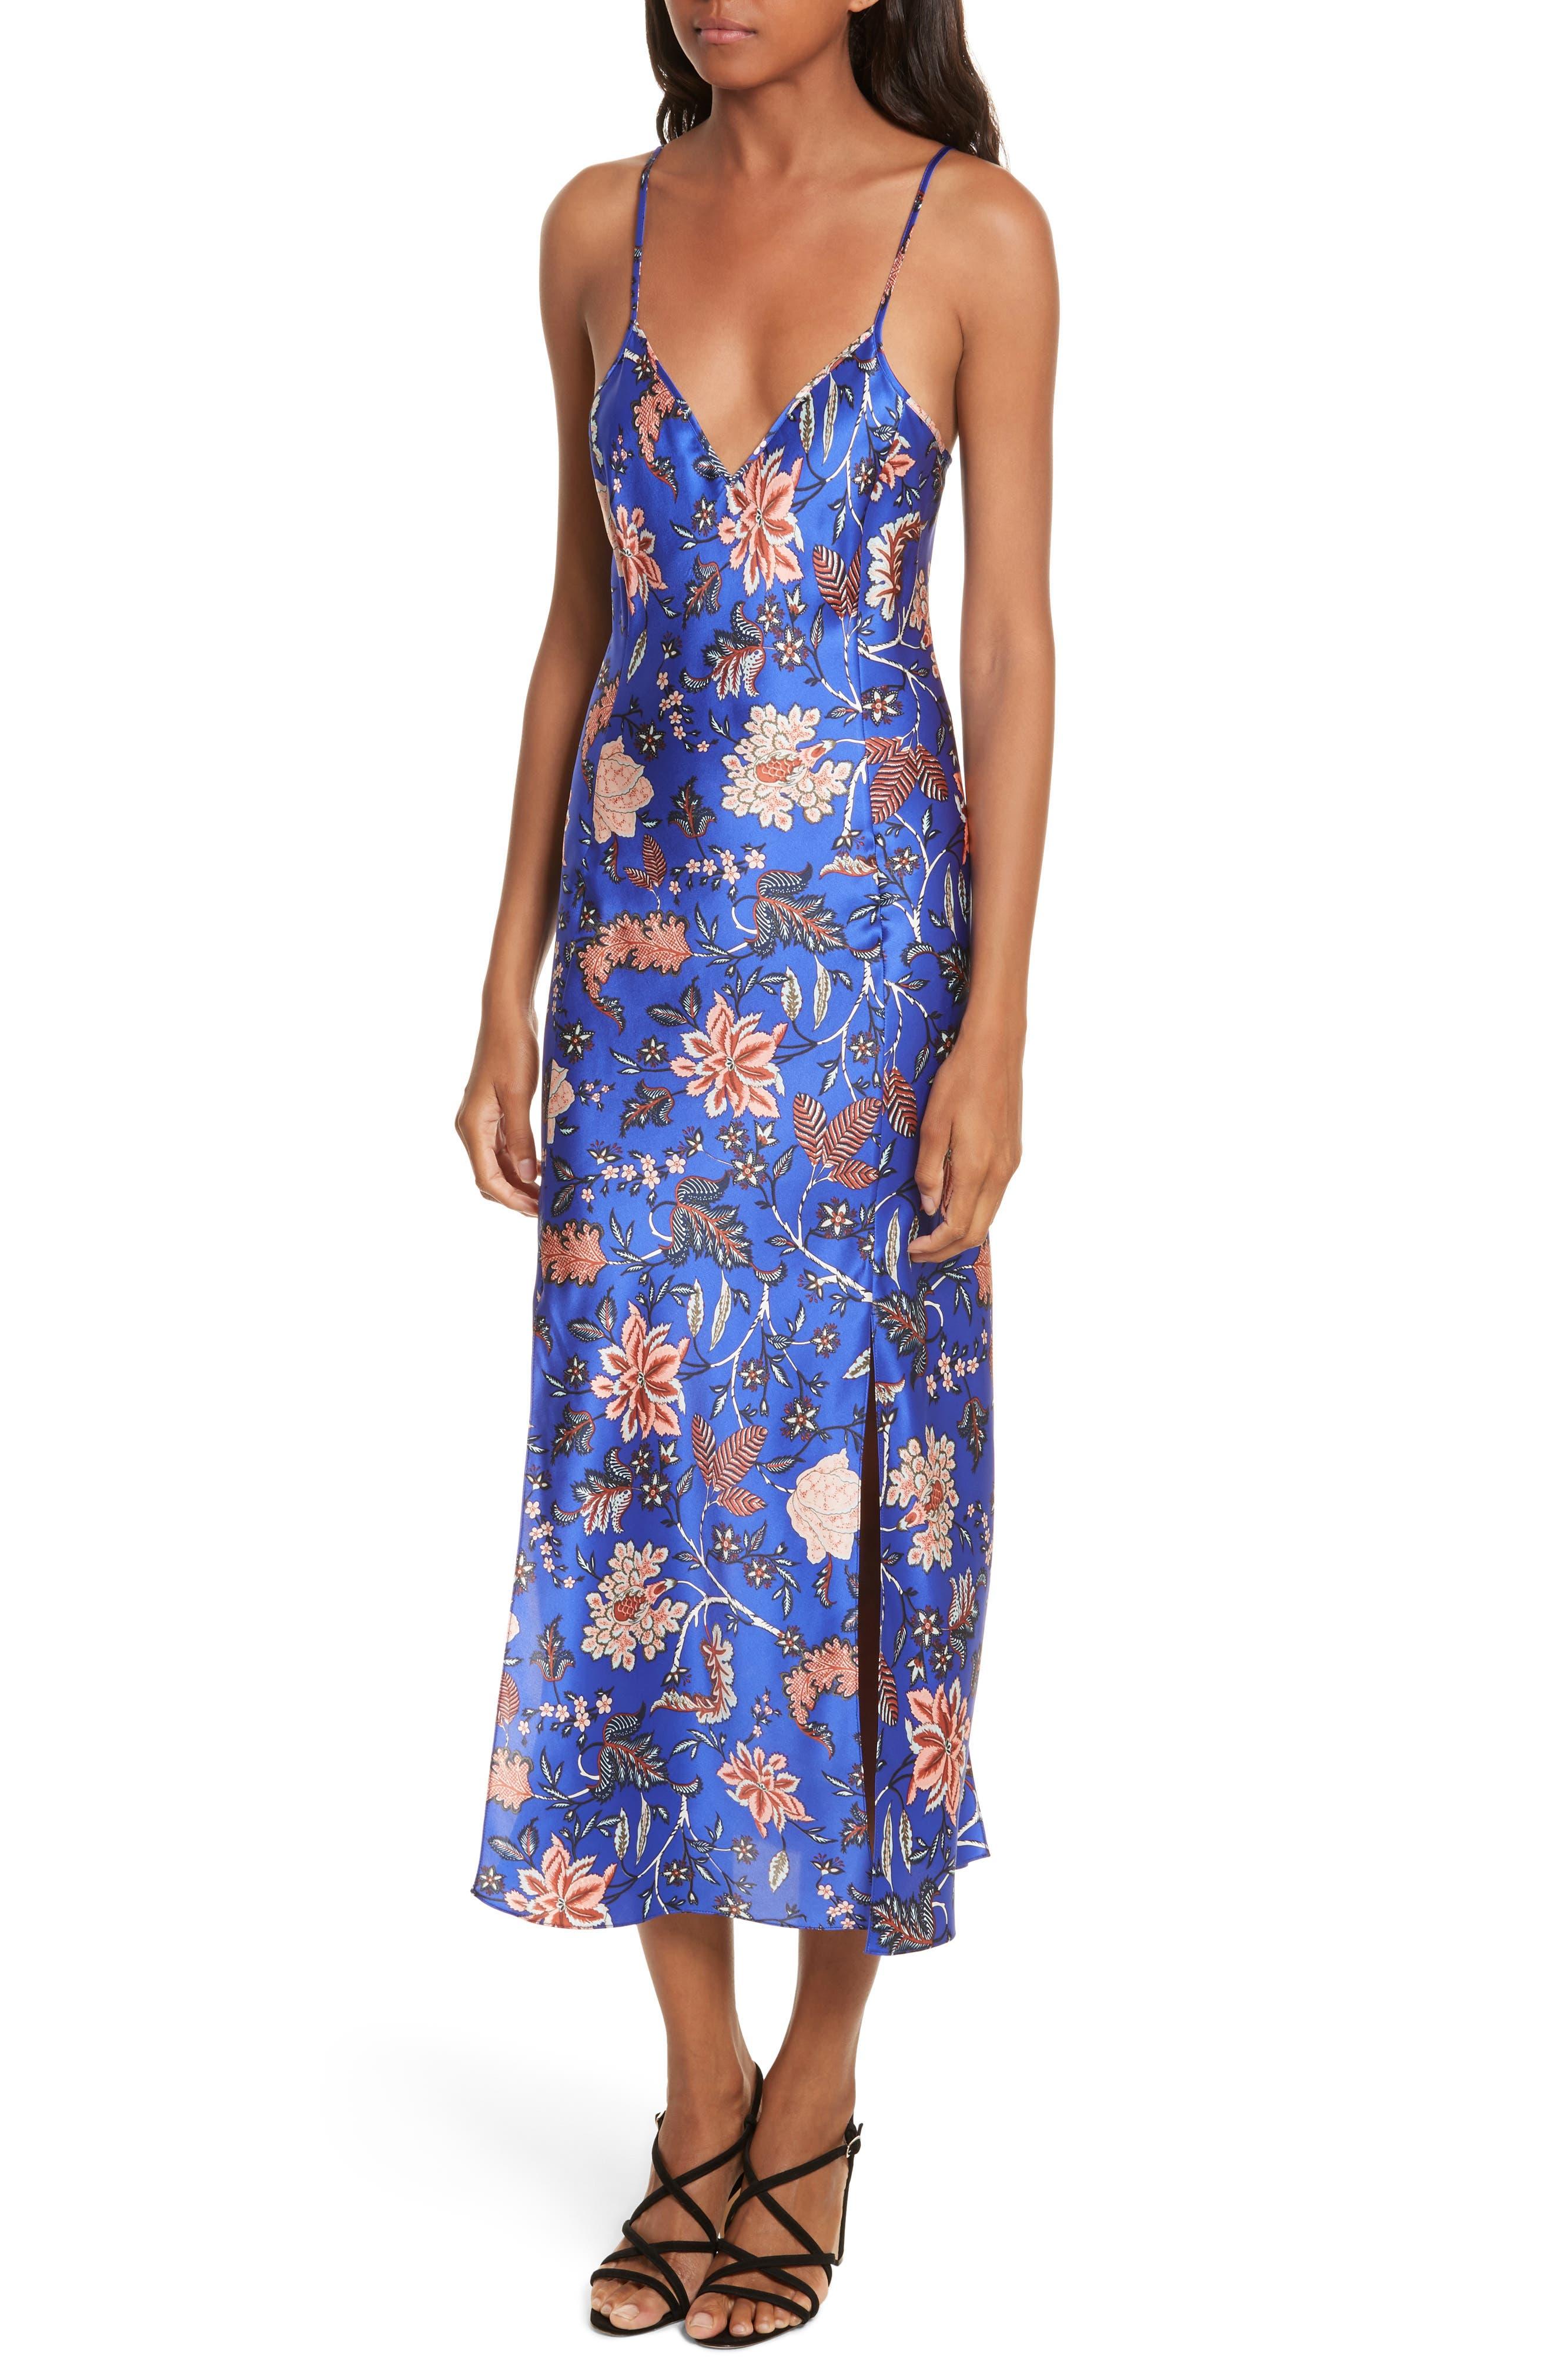 Diane von Furstenberg Mesh Overlay Floral Midi Dress,                             Alternate thumbnail 4, color,                             533